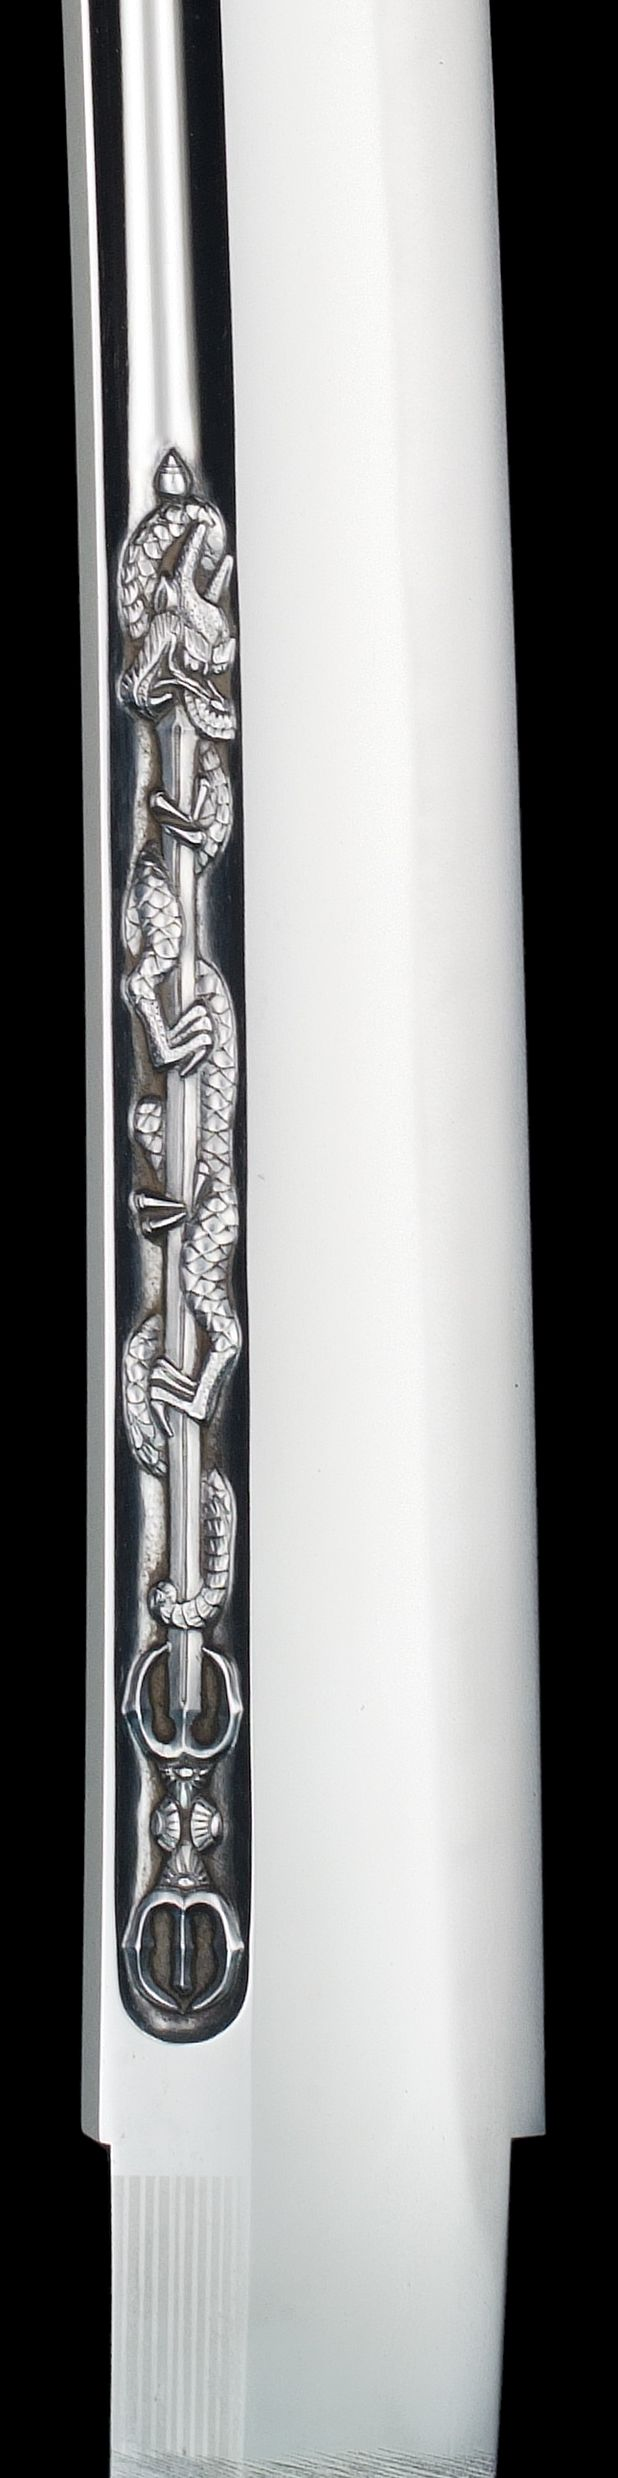 "Close-up of the ""Kurikara-ryu"" Dragon inscribed on the sword by Hirokuni Hiroki 1990. (広木弘邦作 小竜景光写し 倶利伽羅龍)"